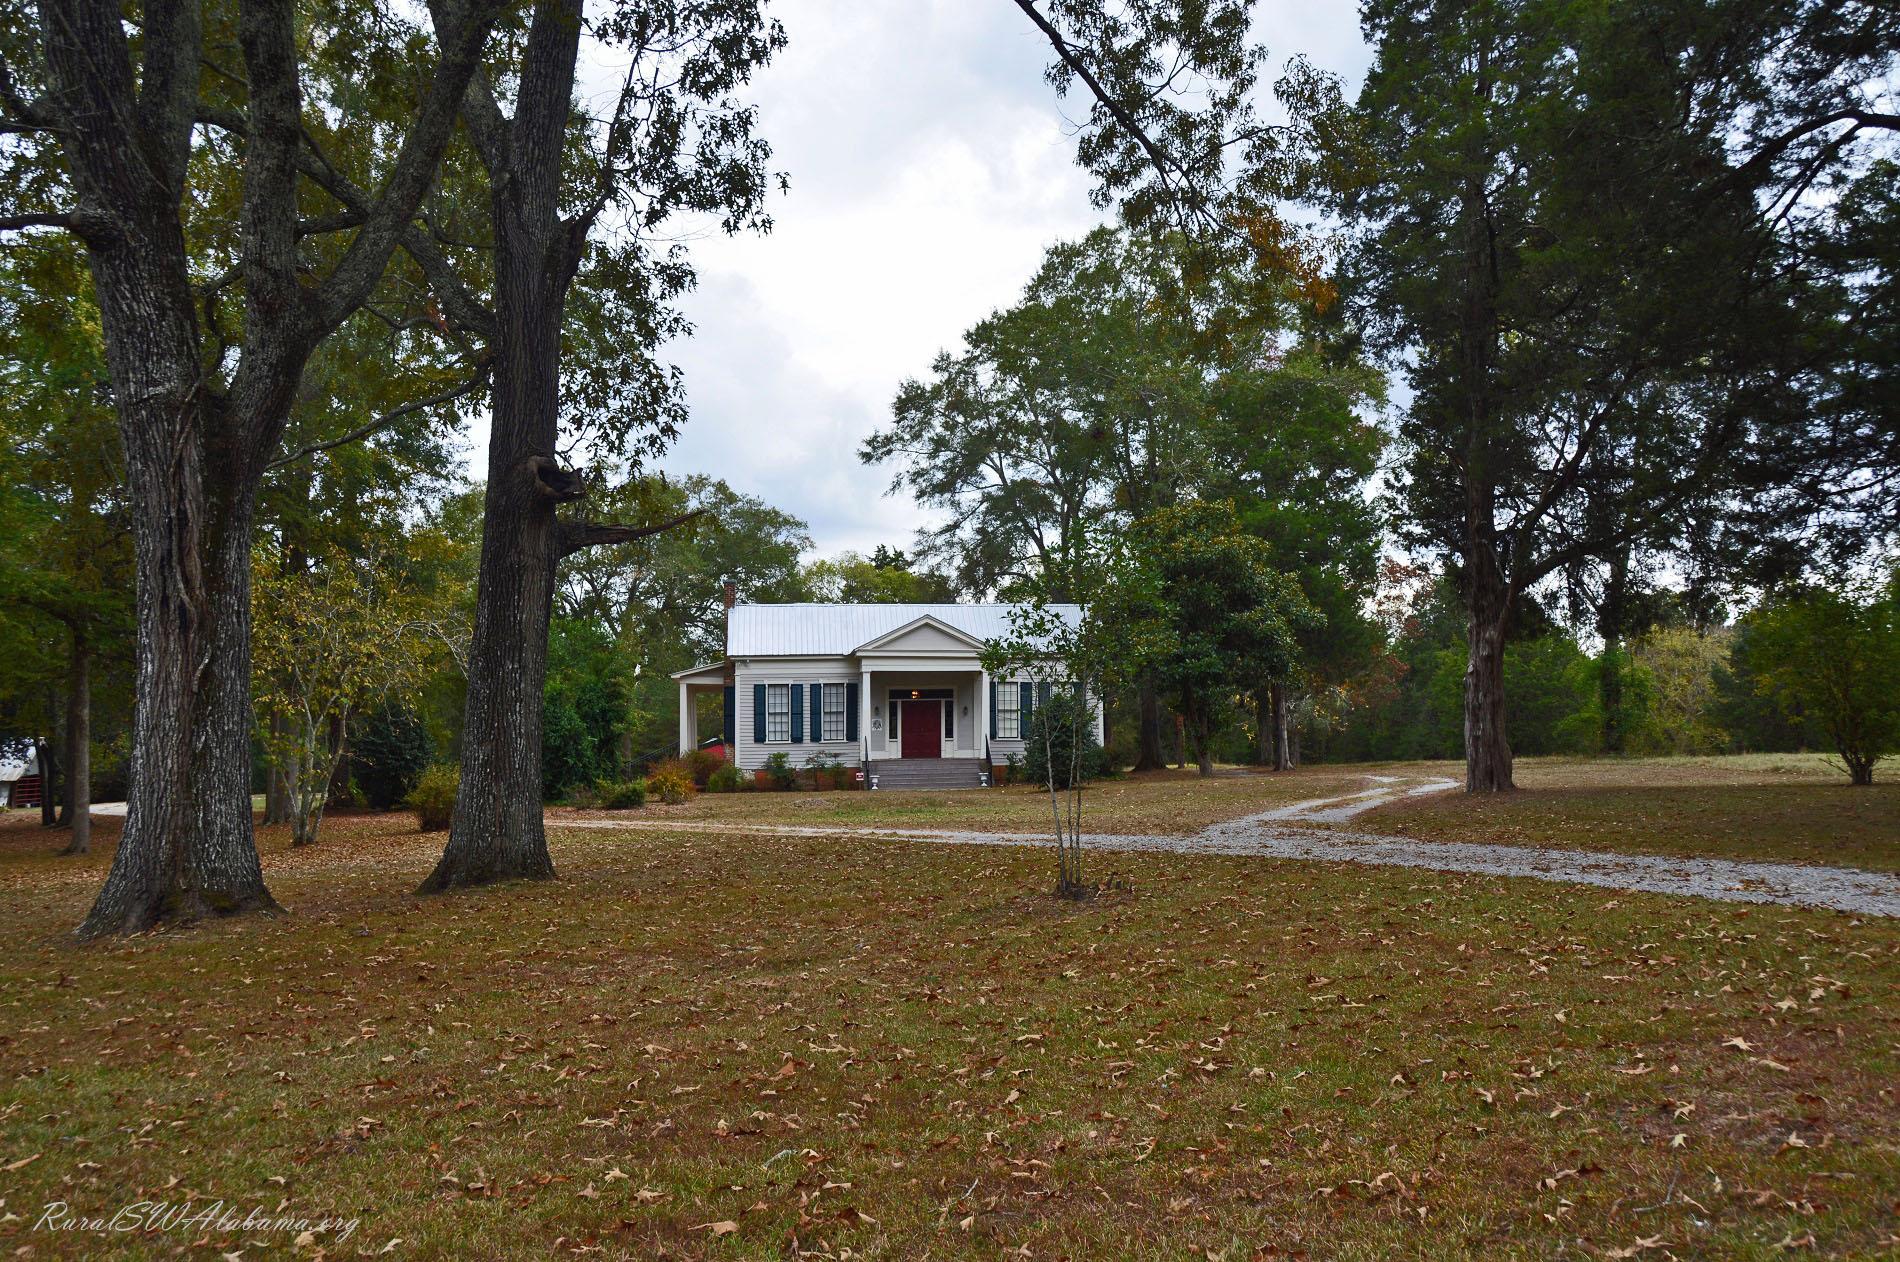 Craigslist Williamsport Farm And Garden | Home & Architecture Design